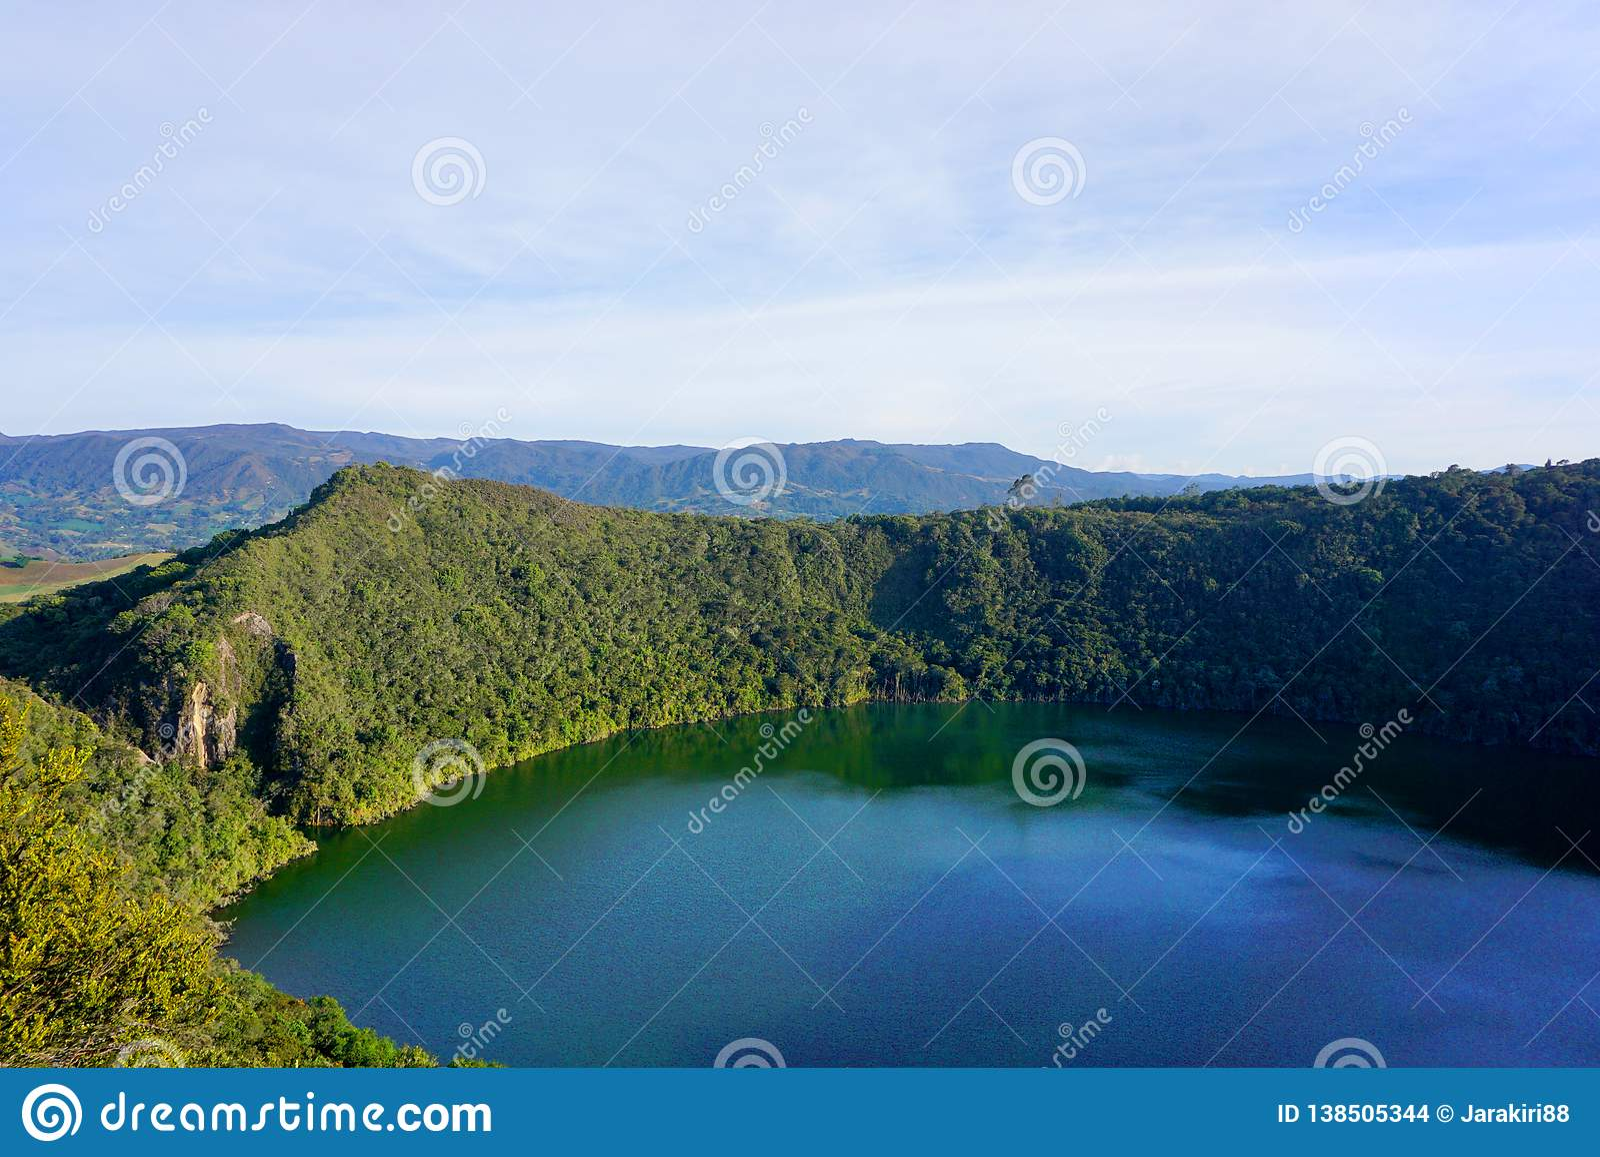 Guatavita, Colombia lagoon or lake el dorado legend